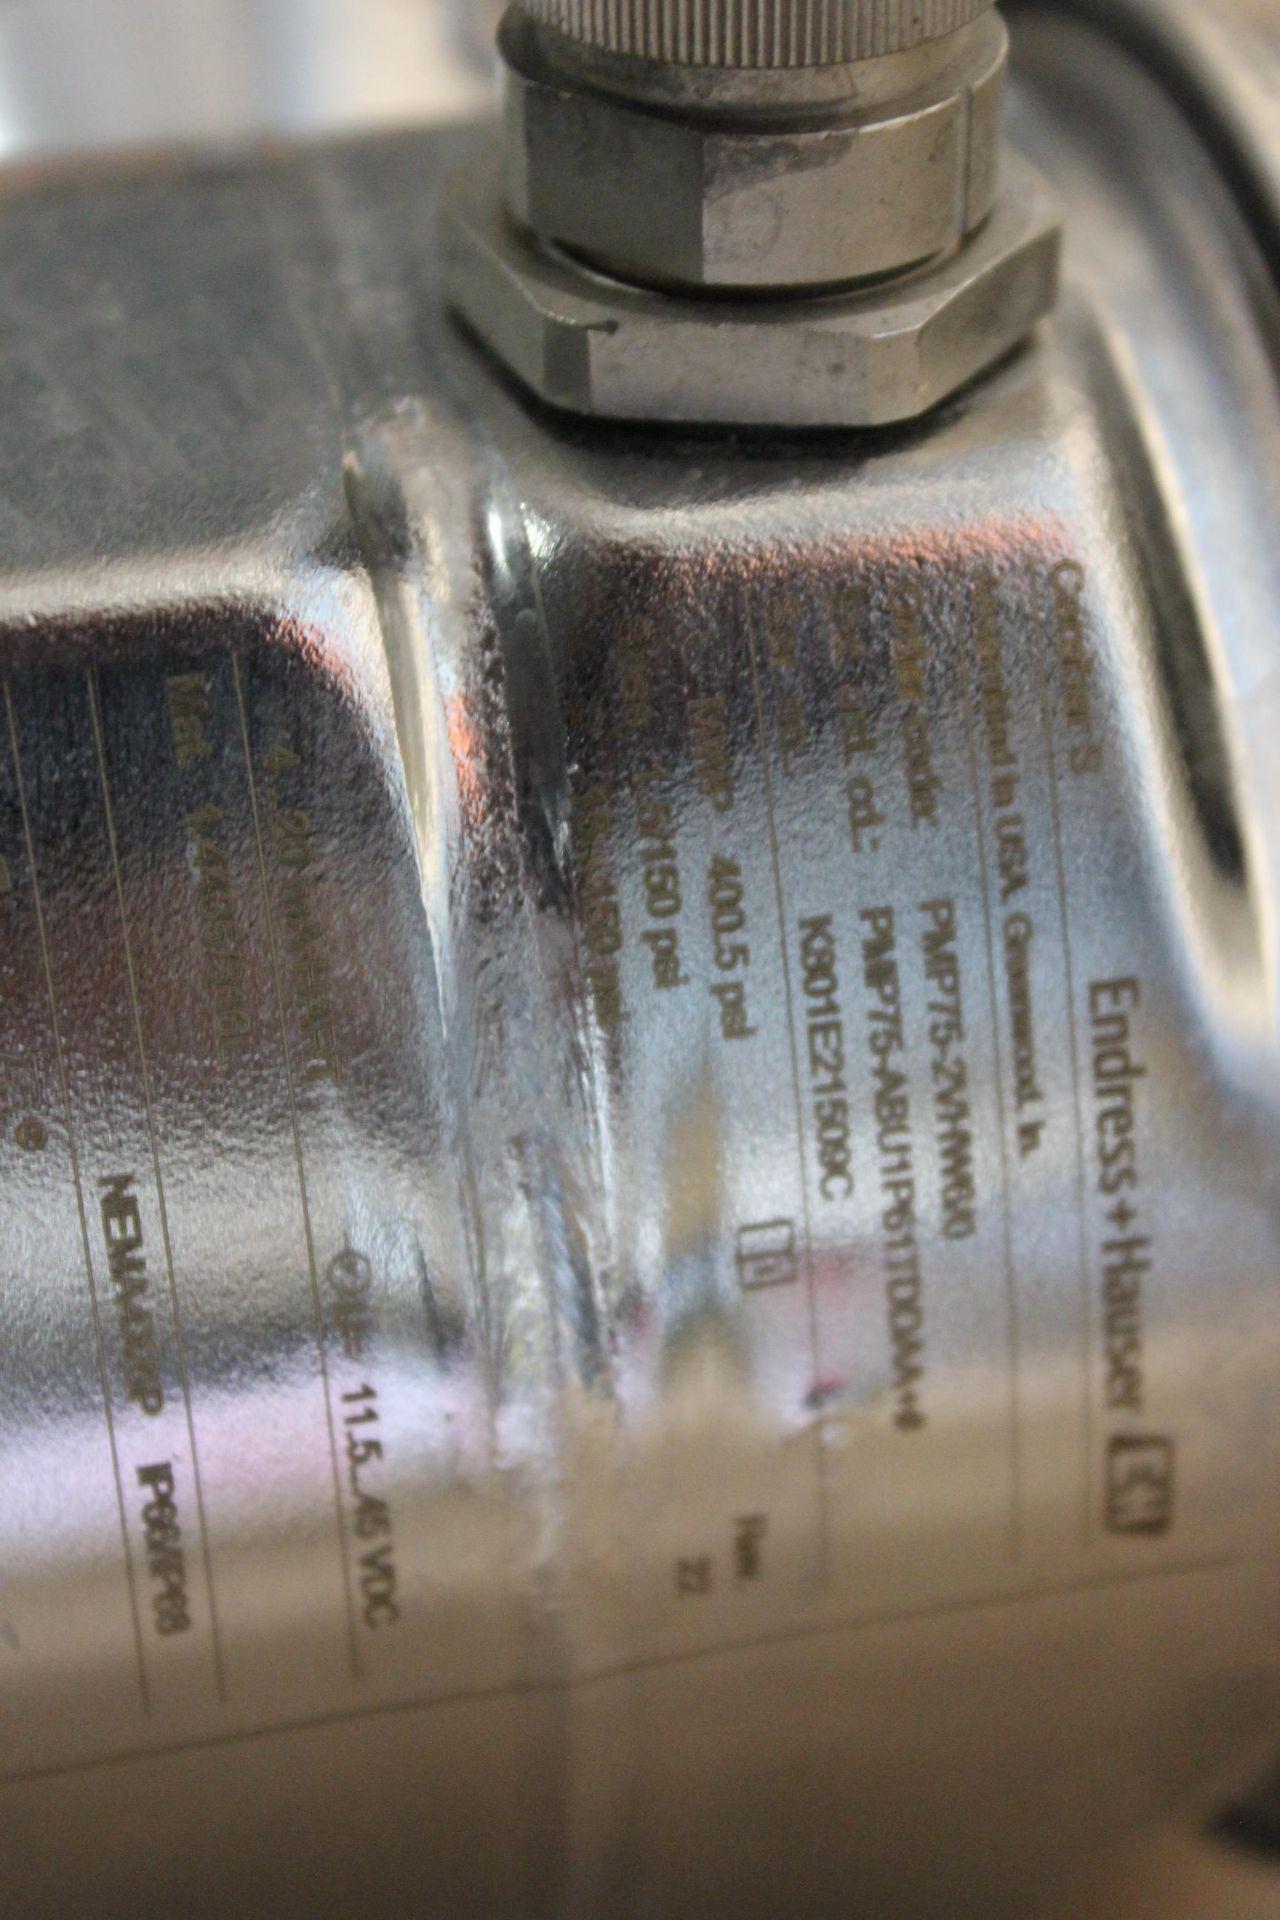 ENDRESS HAUSER CERABAR S DIGITAL PRESSURE TRANSMITTER - Image 3 of 4